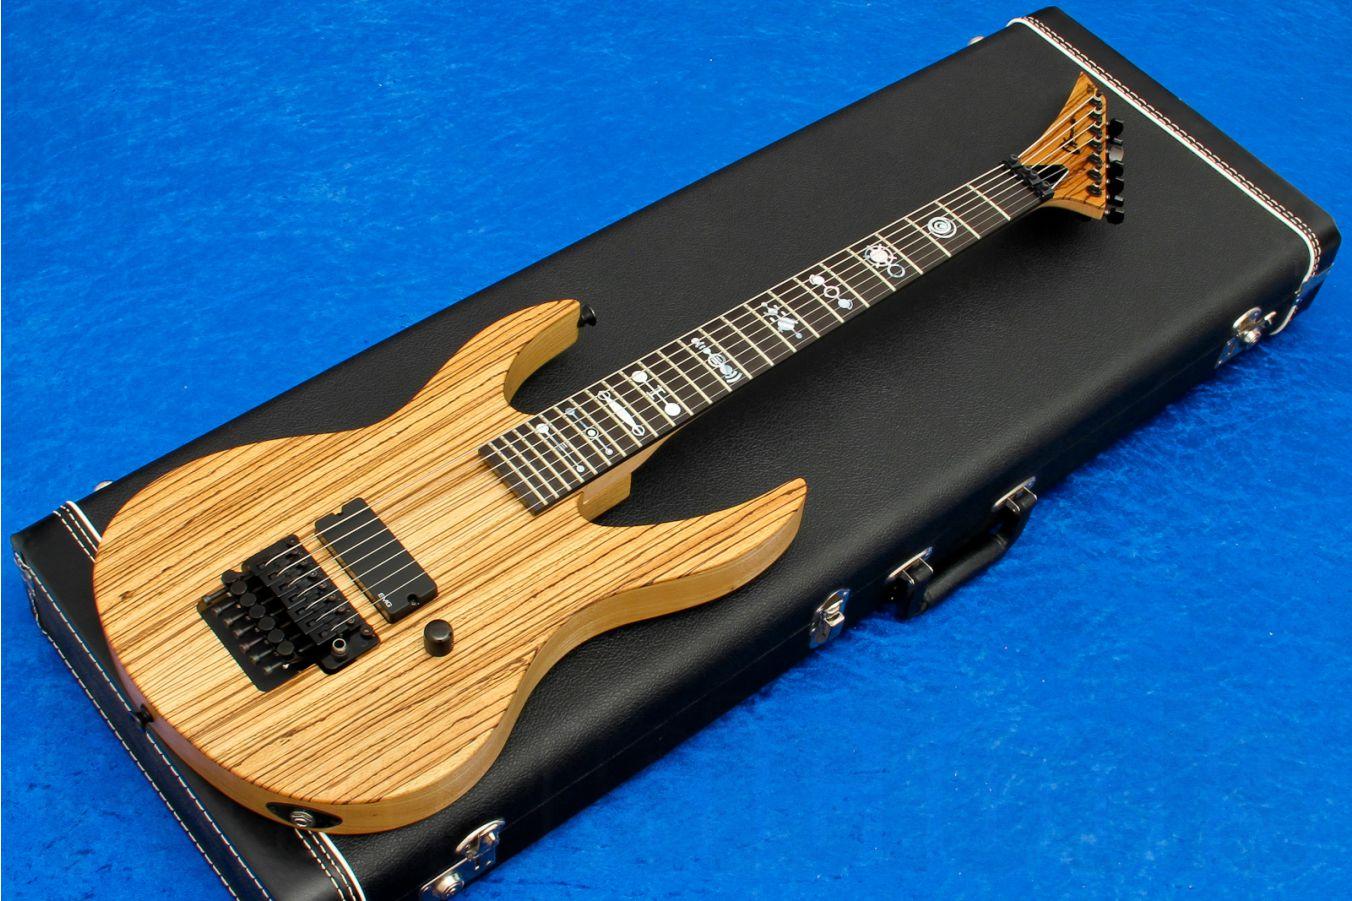 Charvel USA Custom Shop Demon 7 FR - Natural Ash Zebrawood Top